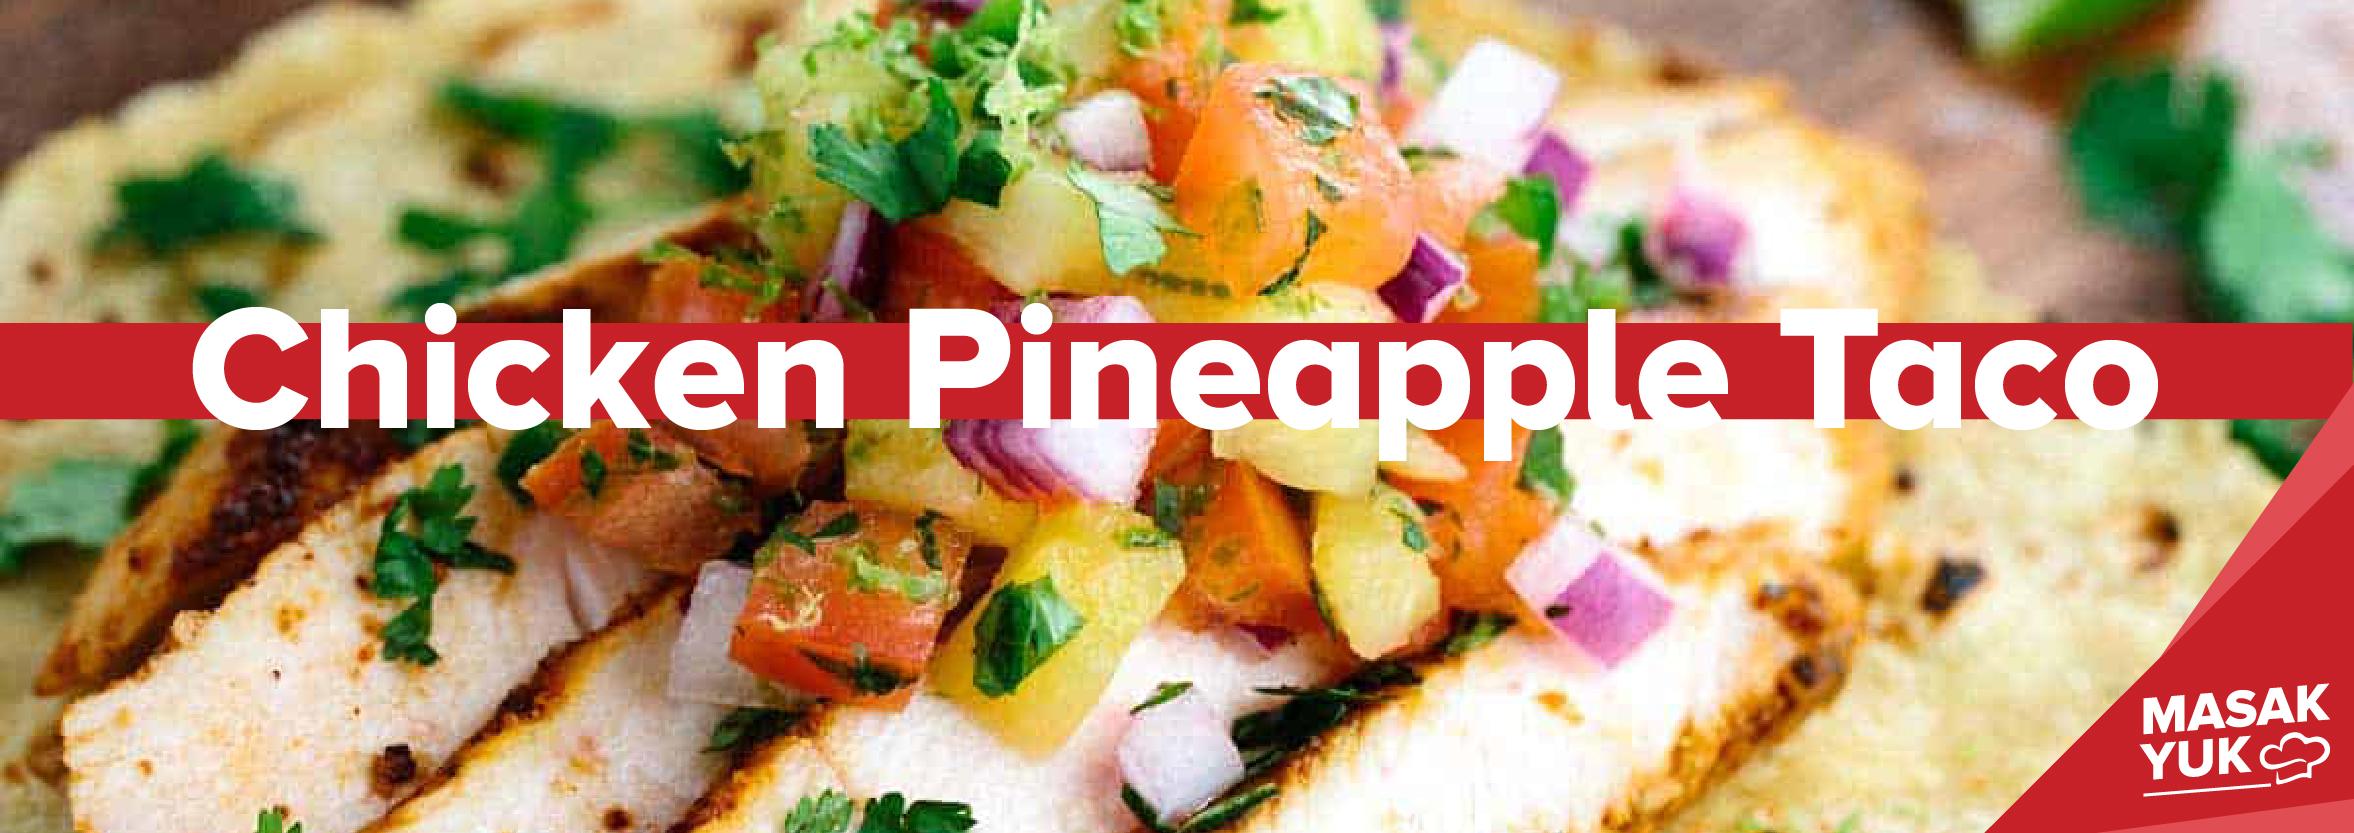 Resep Chicken Pineapple Taco